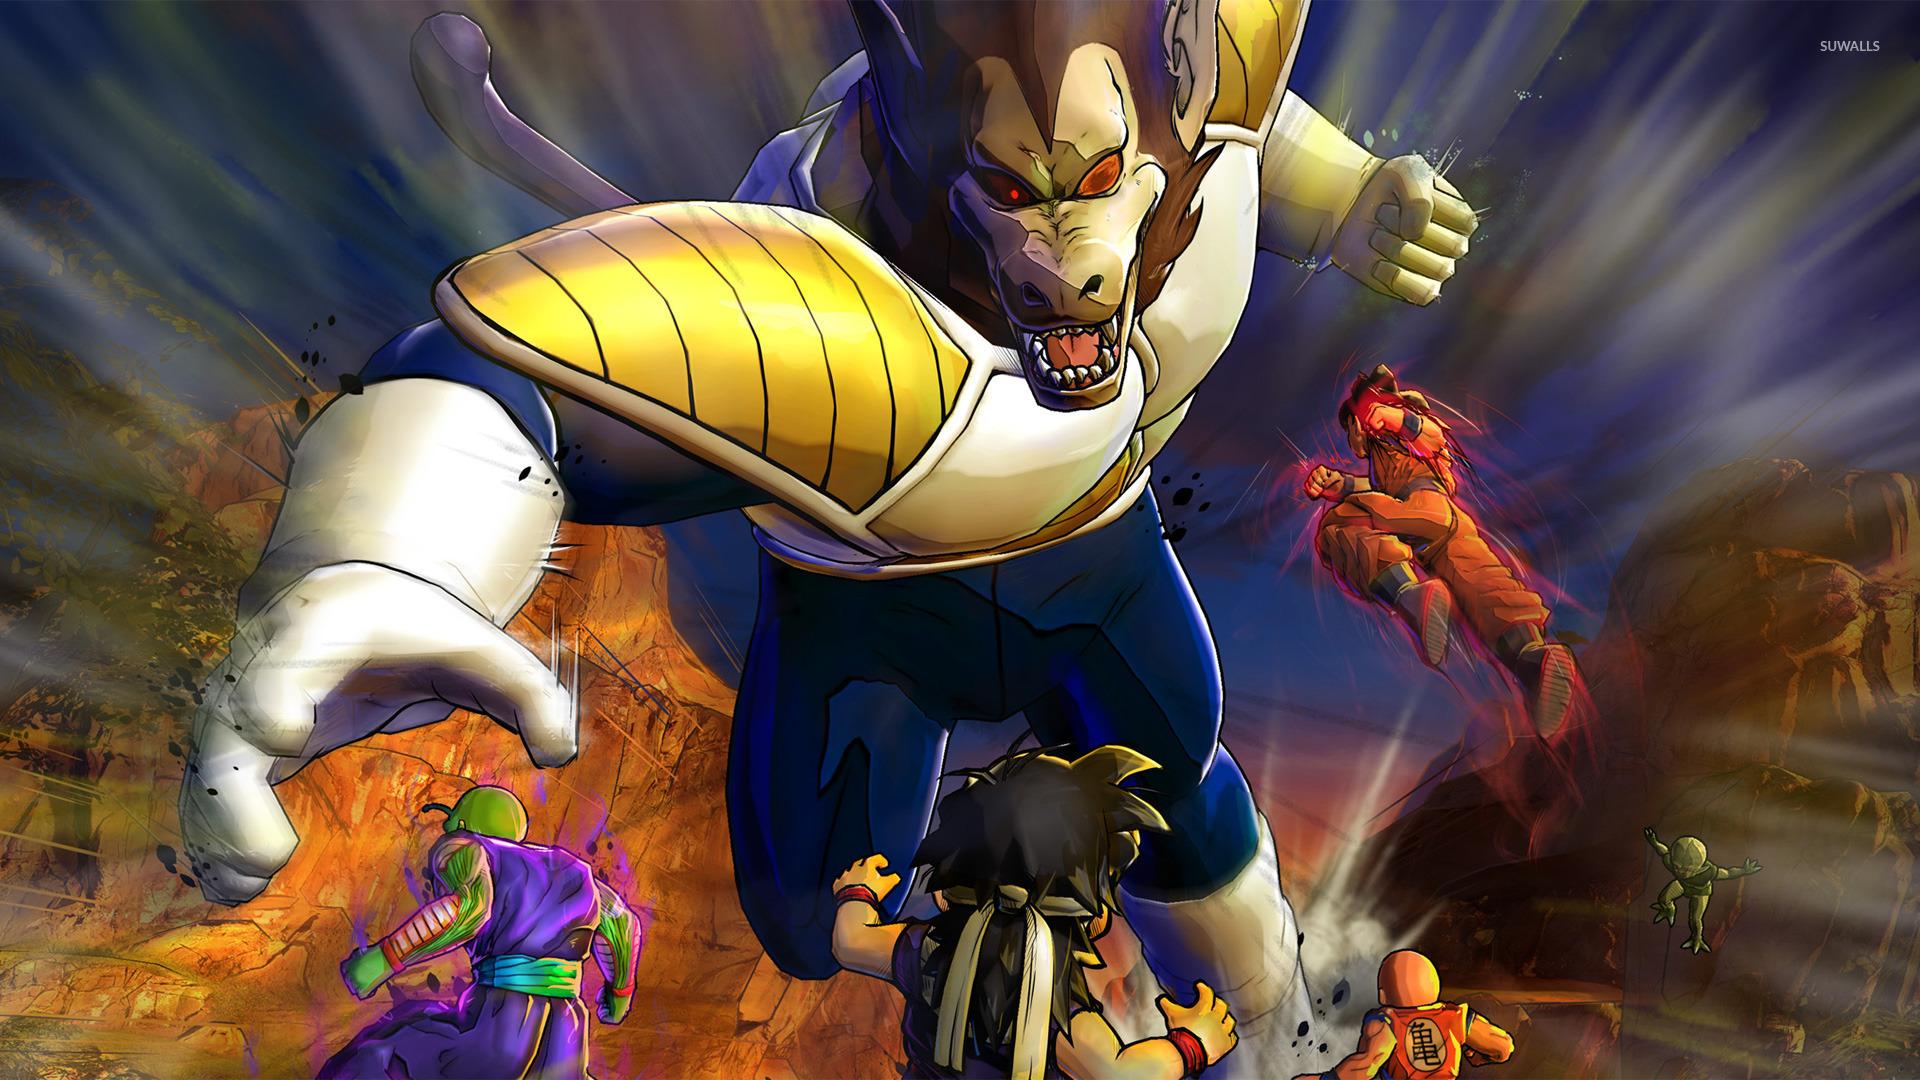 Dragon Ball Z Battle Of Gods Wallpaper Anime Wallpapers 24322